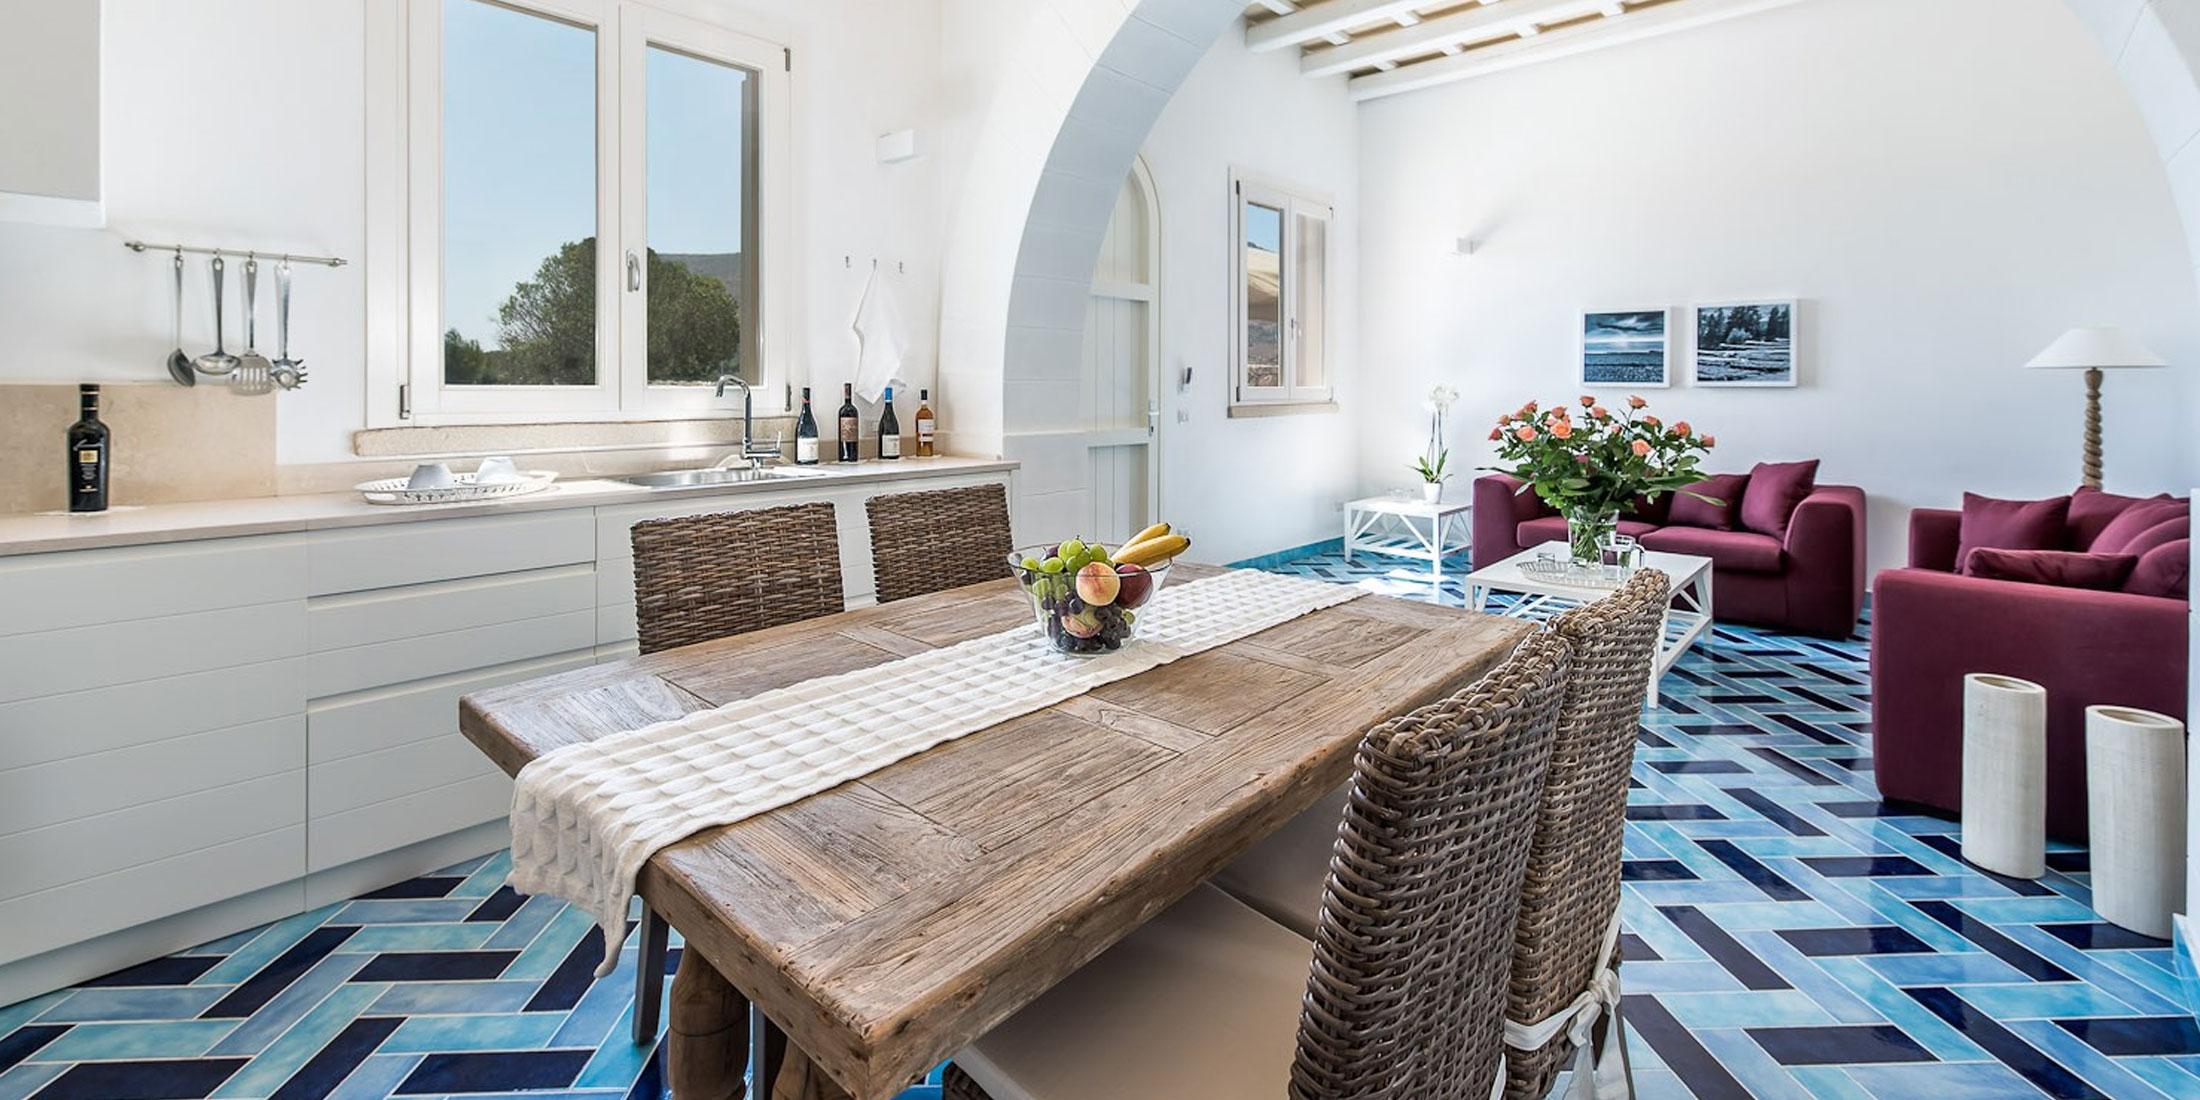 Calamoni Di Favignana Firriato Hospitality Apartments Wine